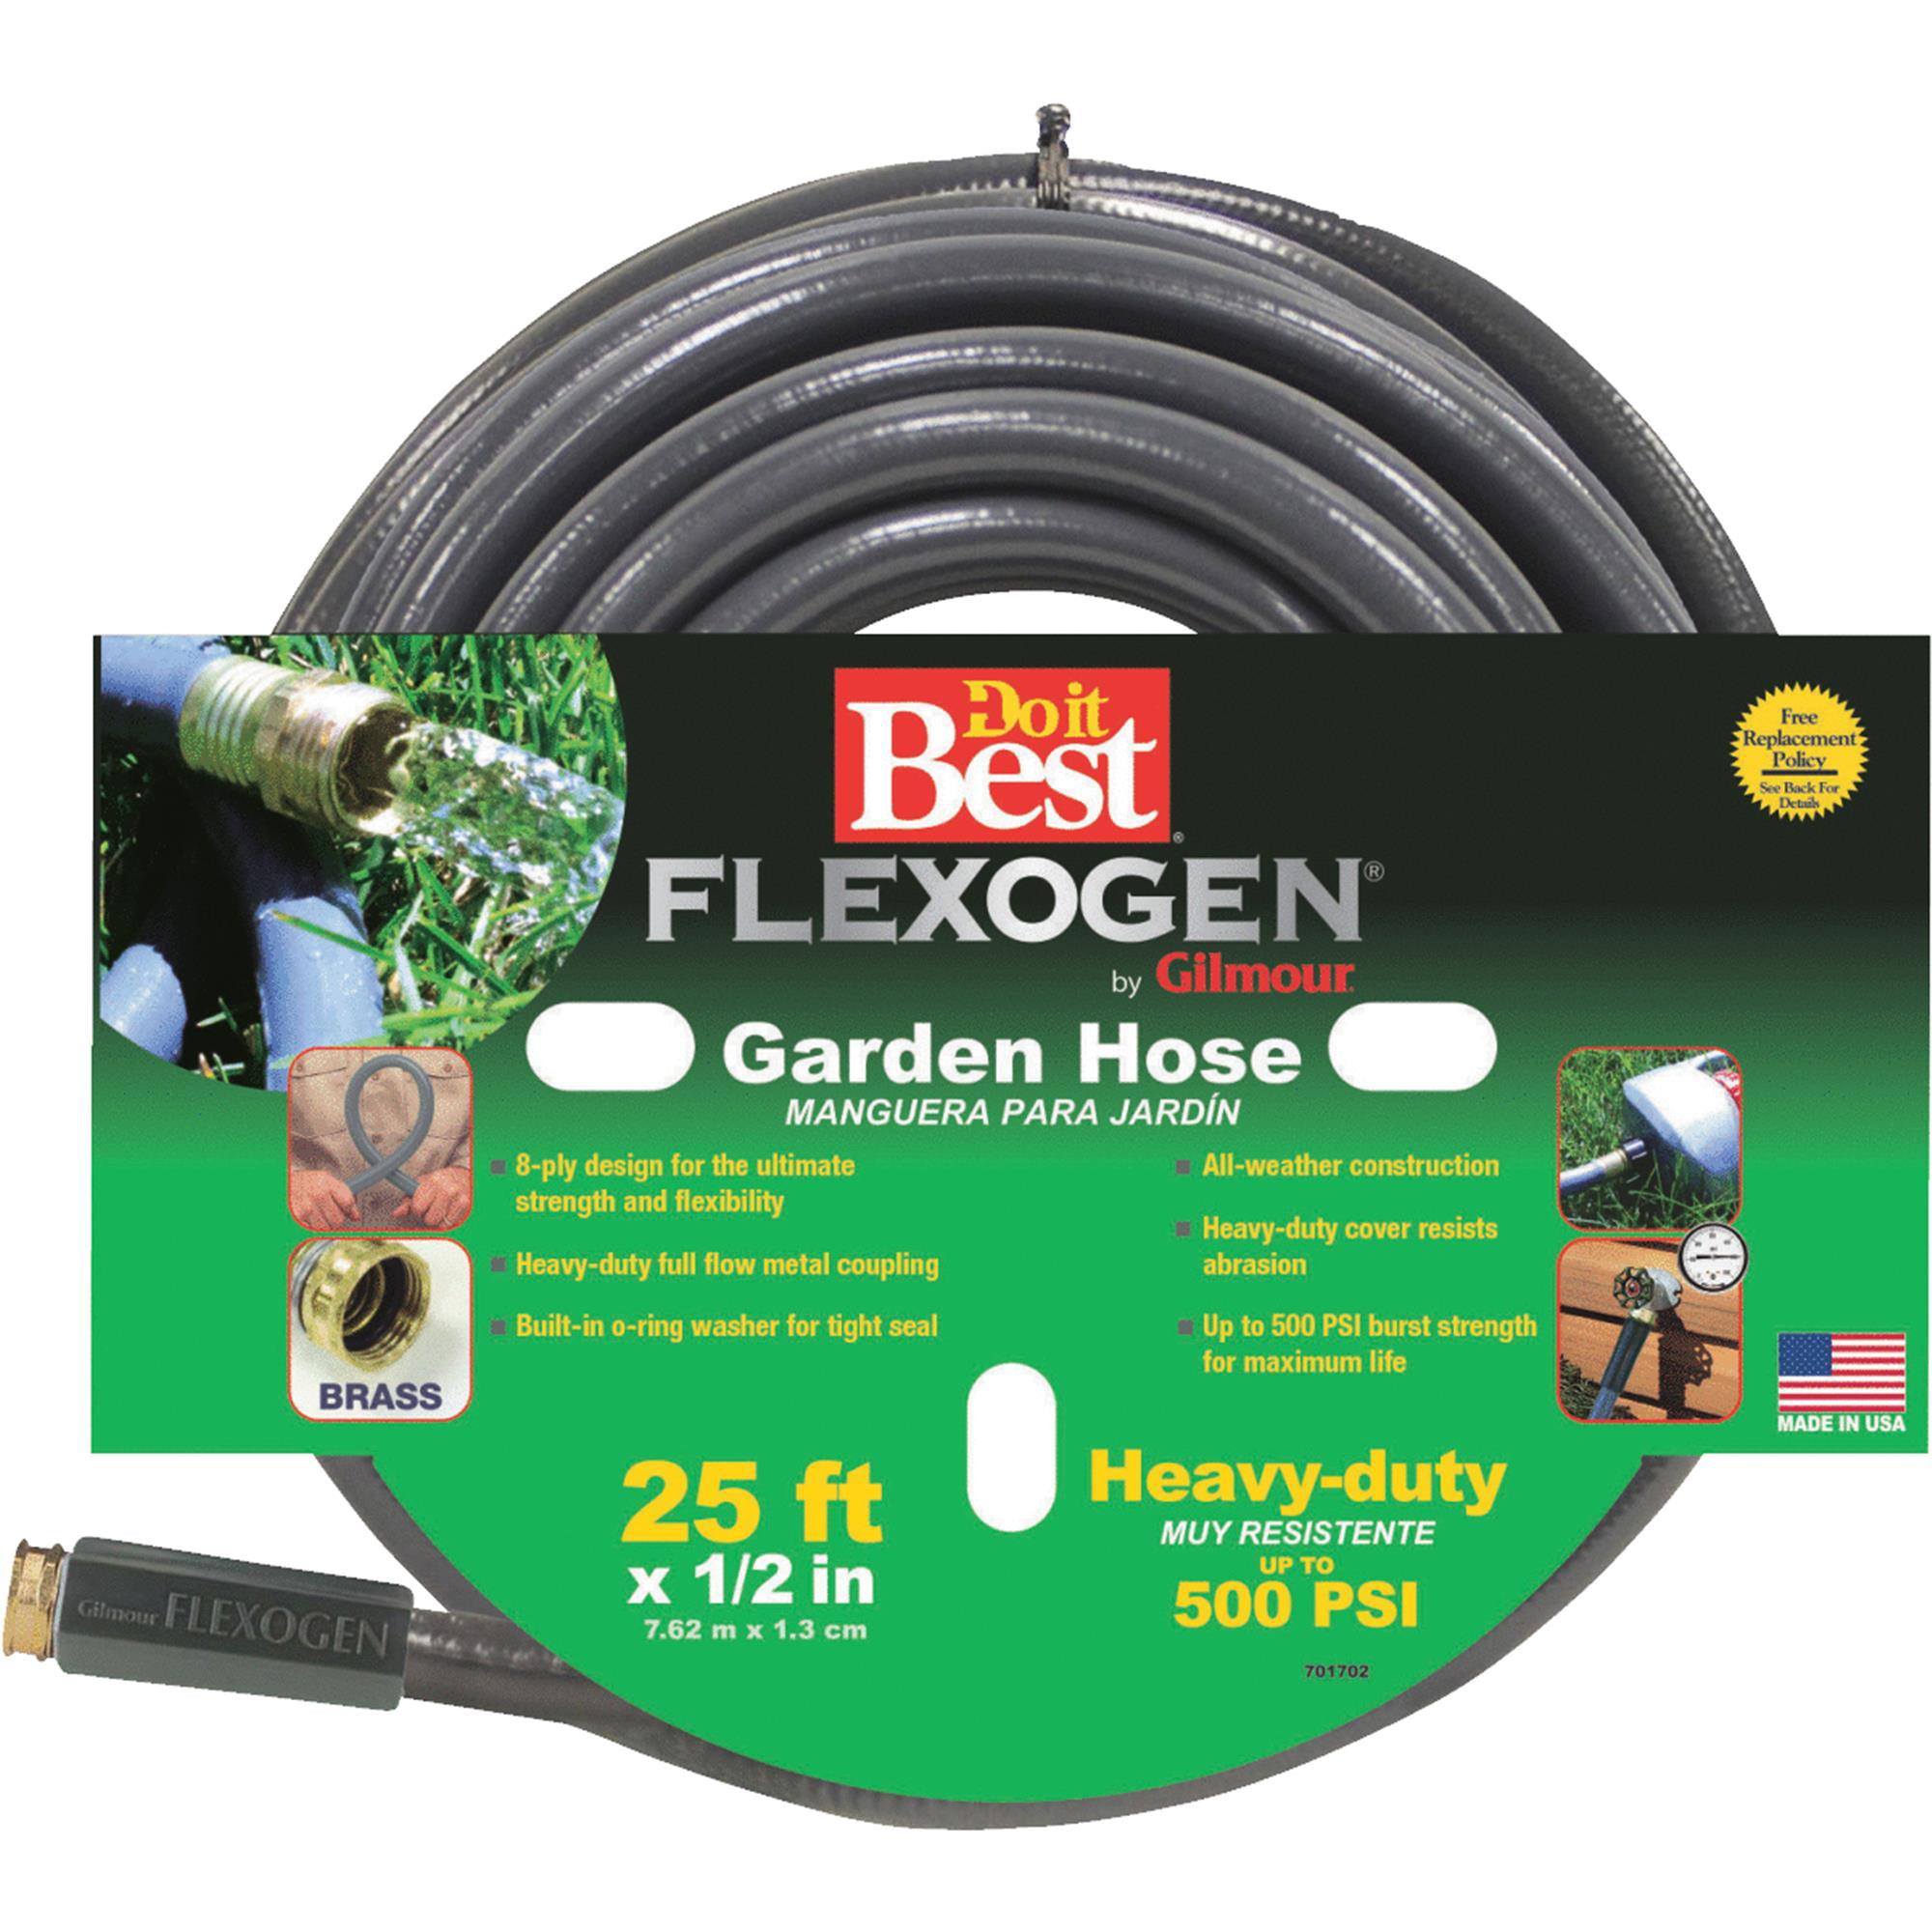 Best Garden Flexogen Heavy-Duty Garden Hose